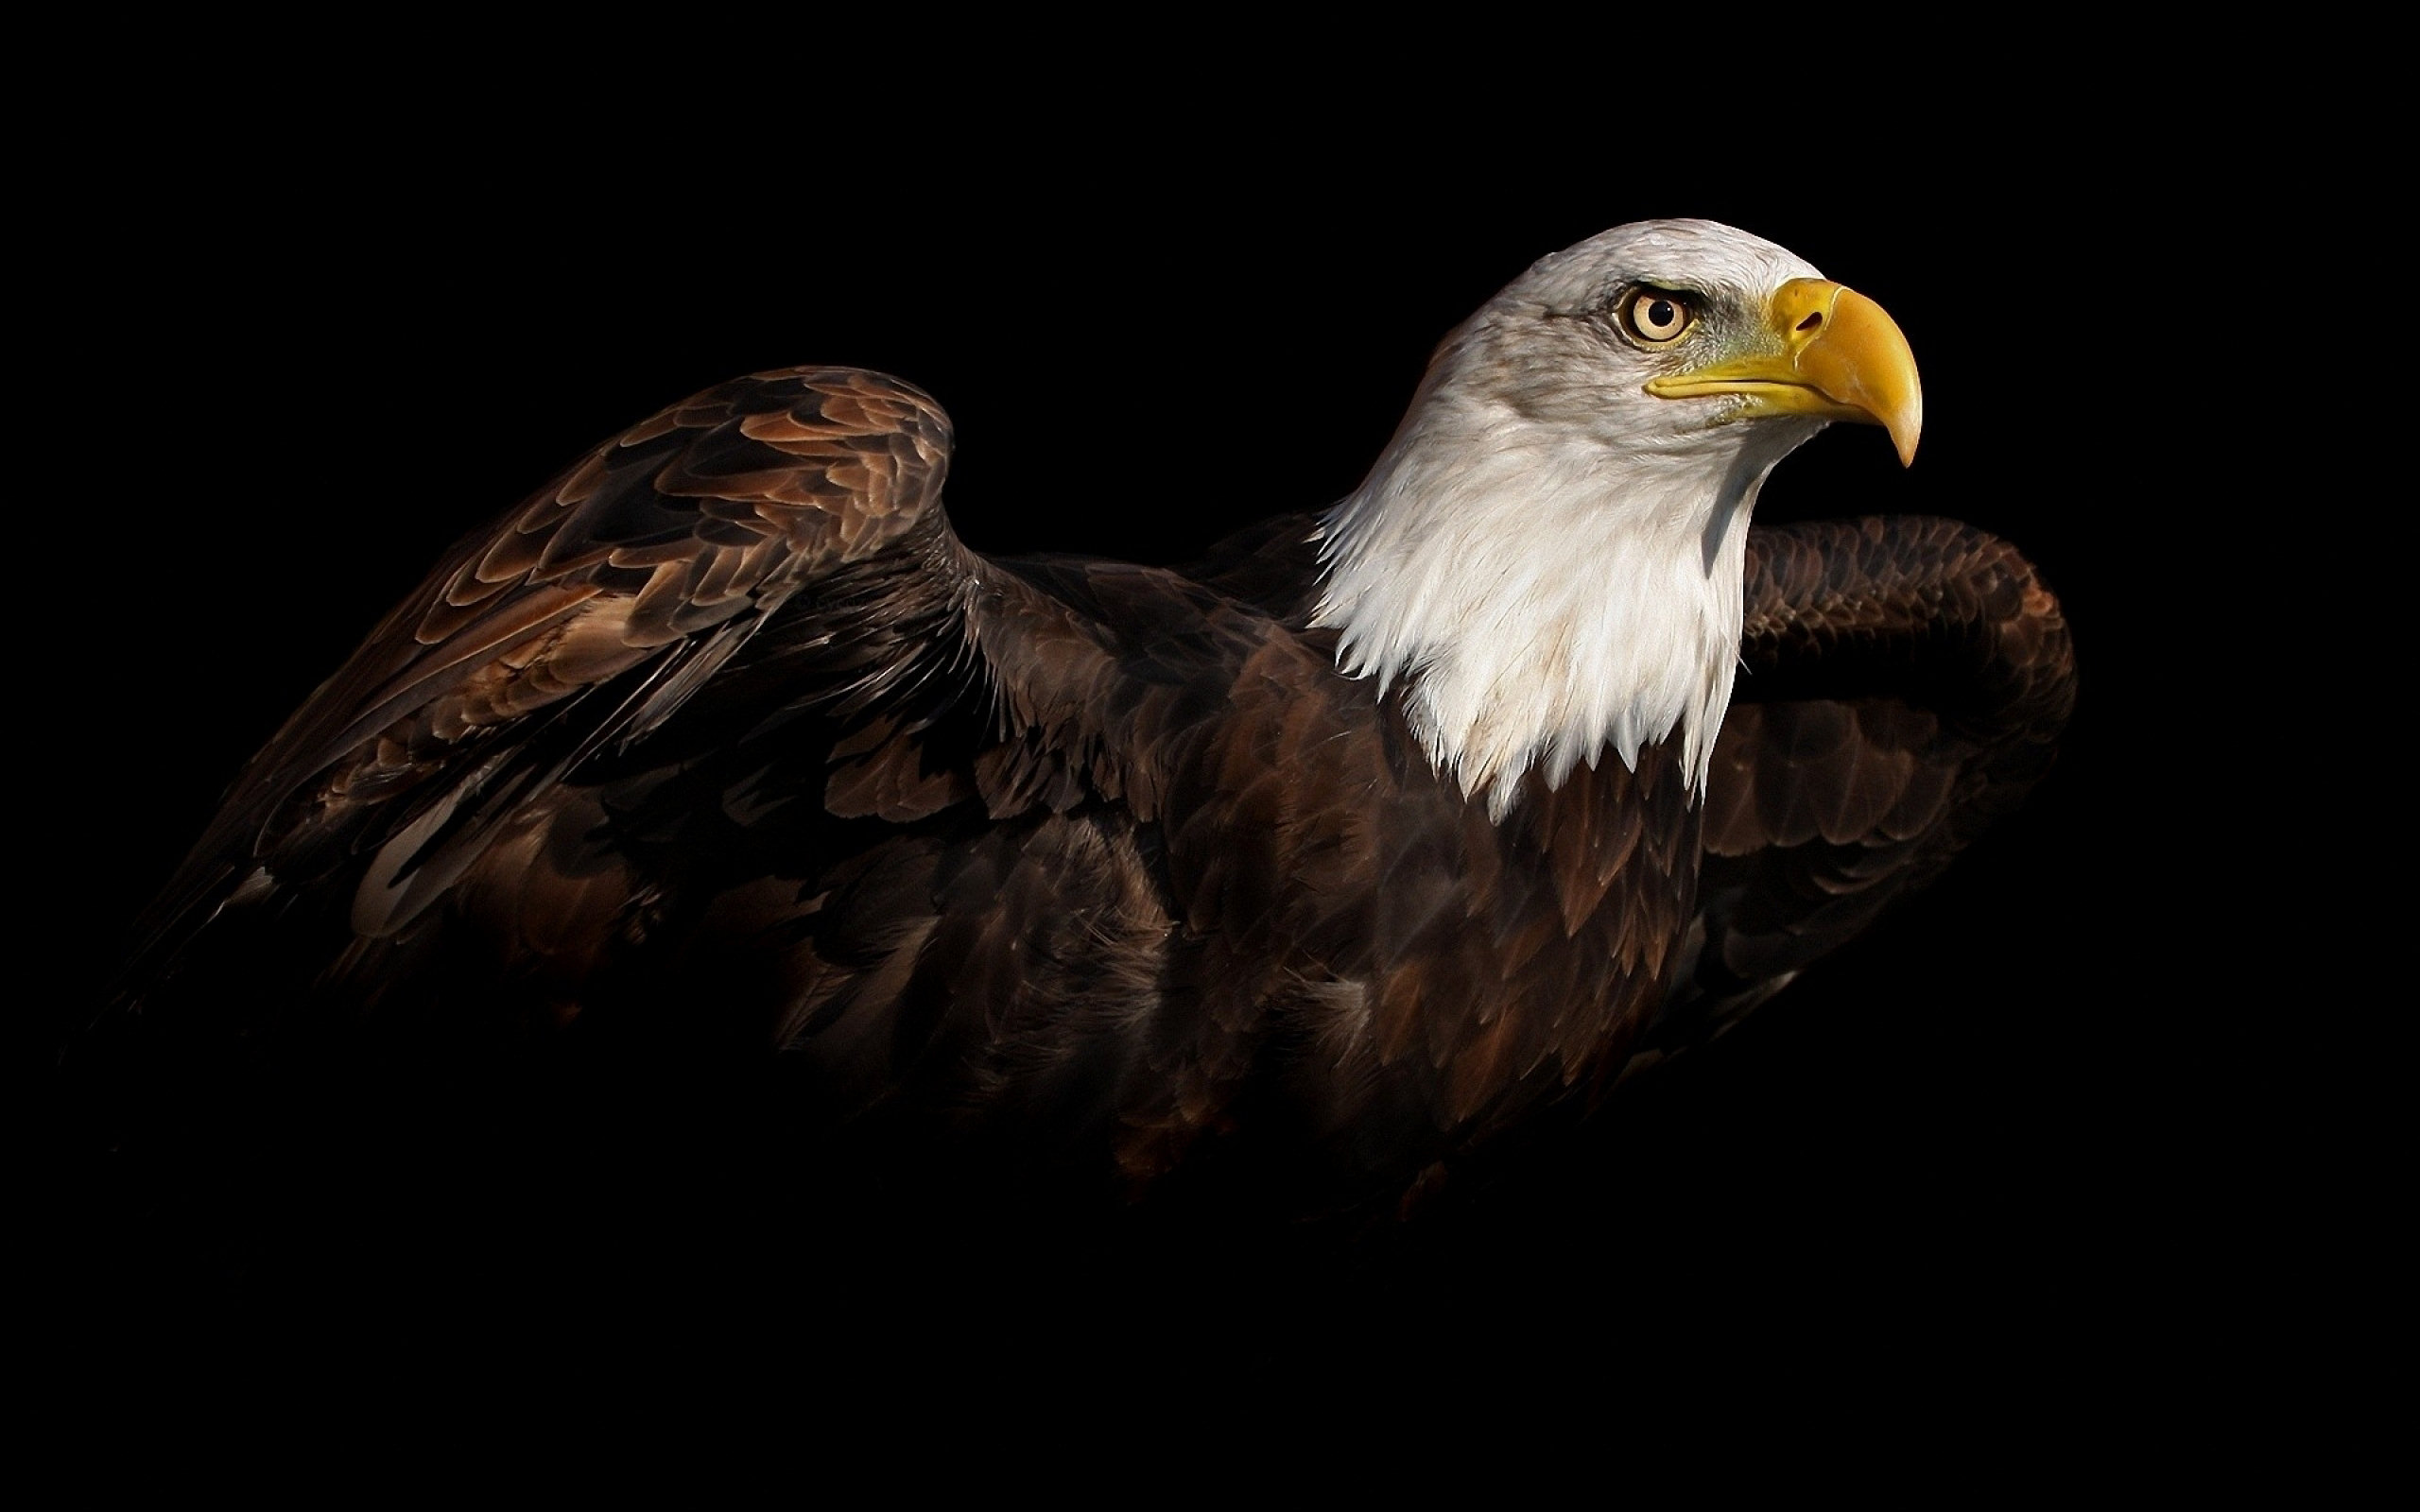 Bald Eagle Hd Wallpaper Background Image 2560x1600 Id